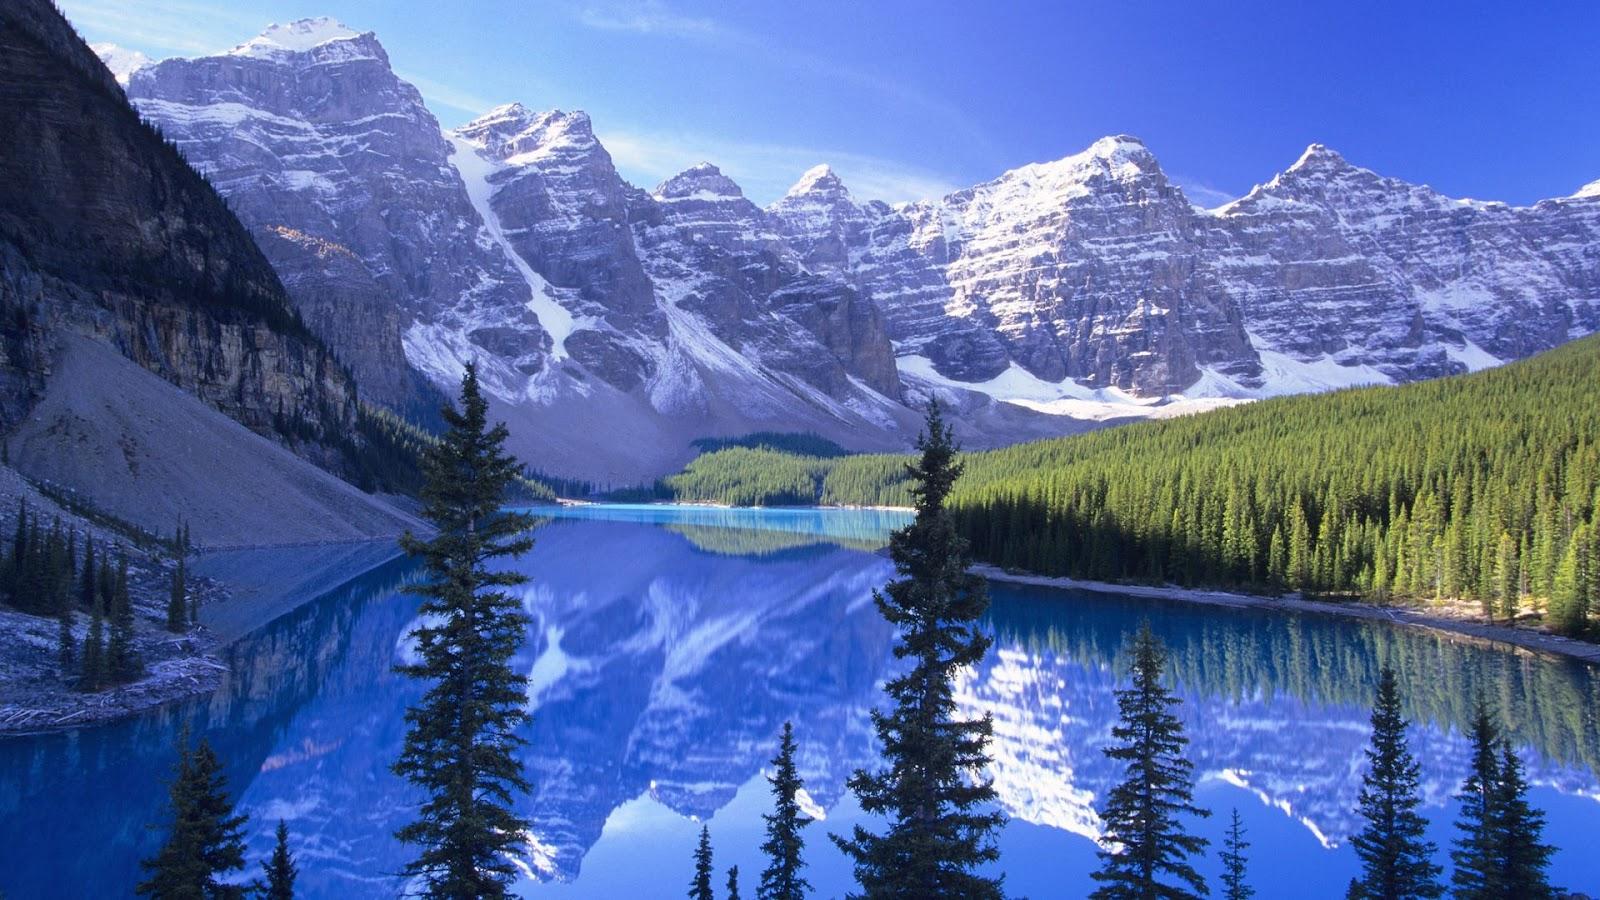 48] HD Snowy Mountain Wallpaper on WallpaperSafari 1600x900